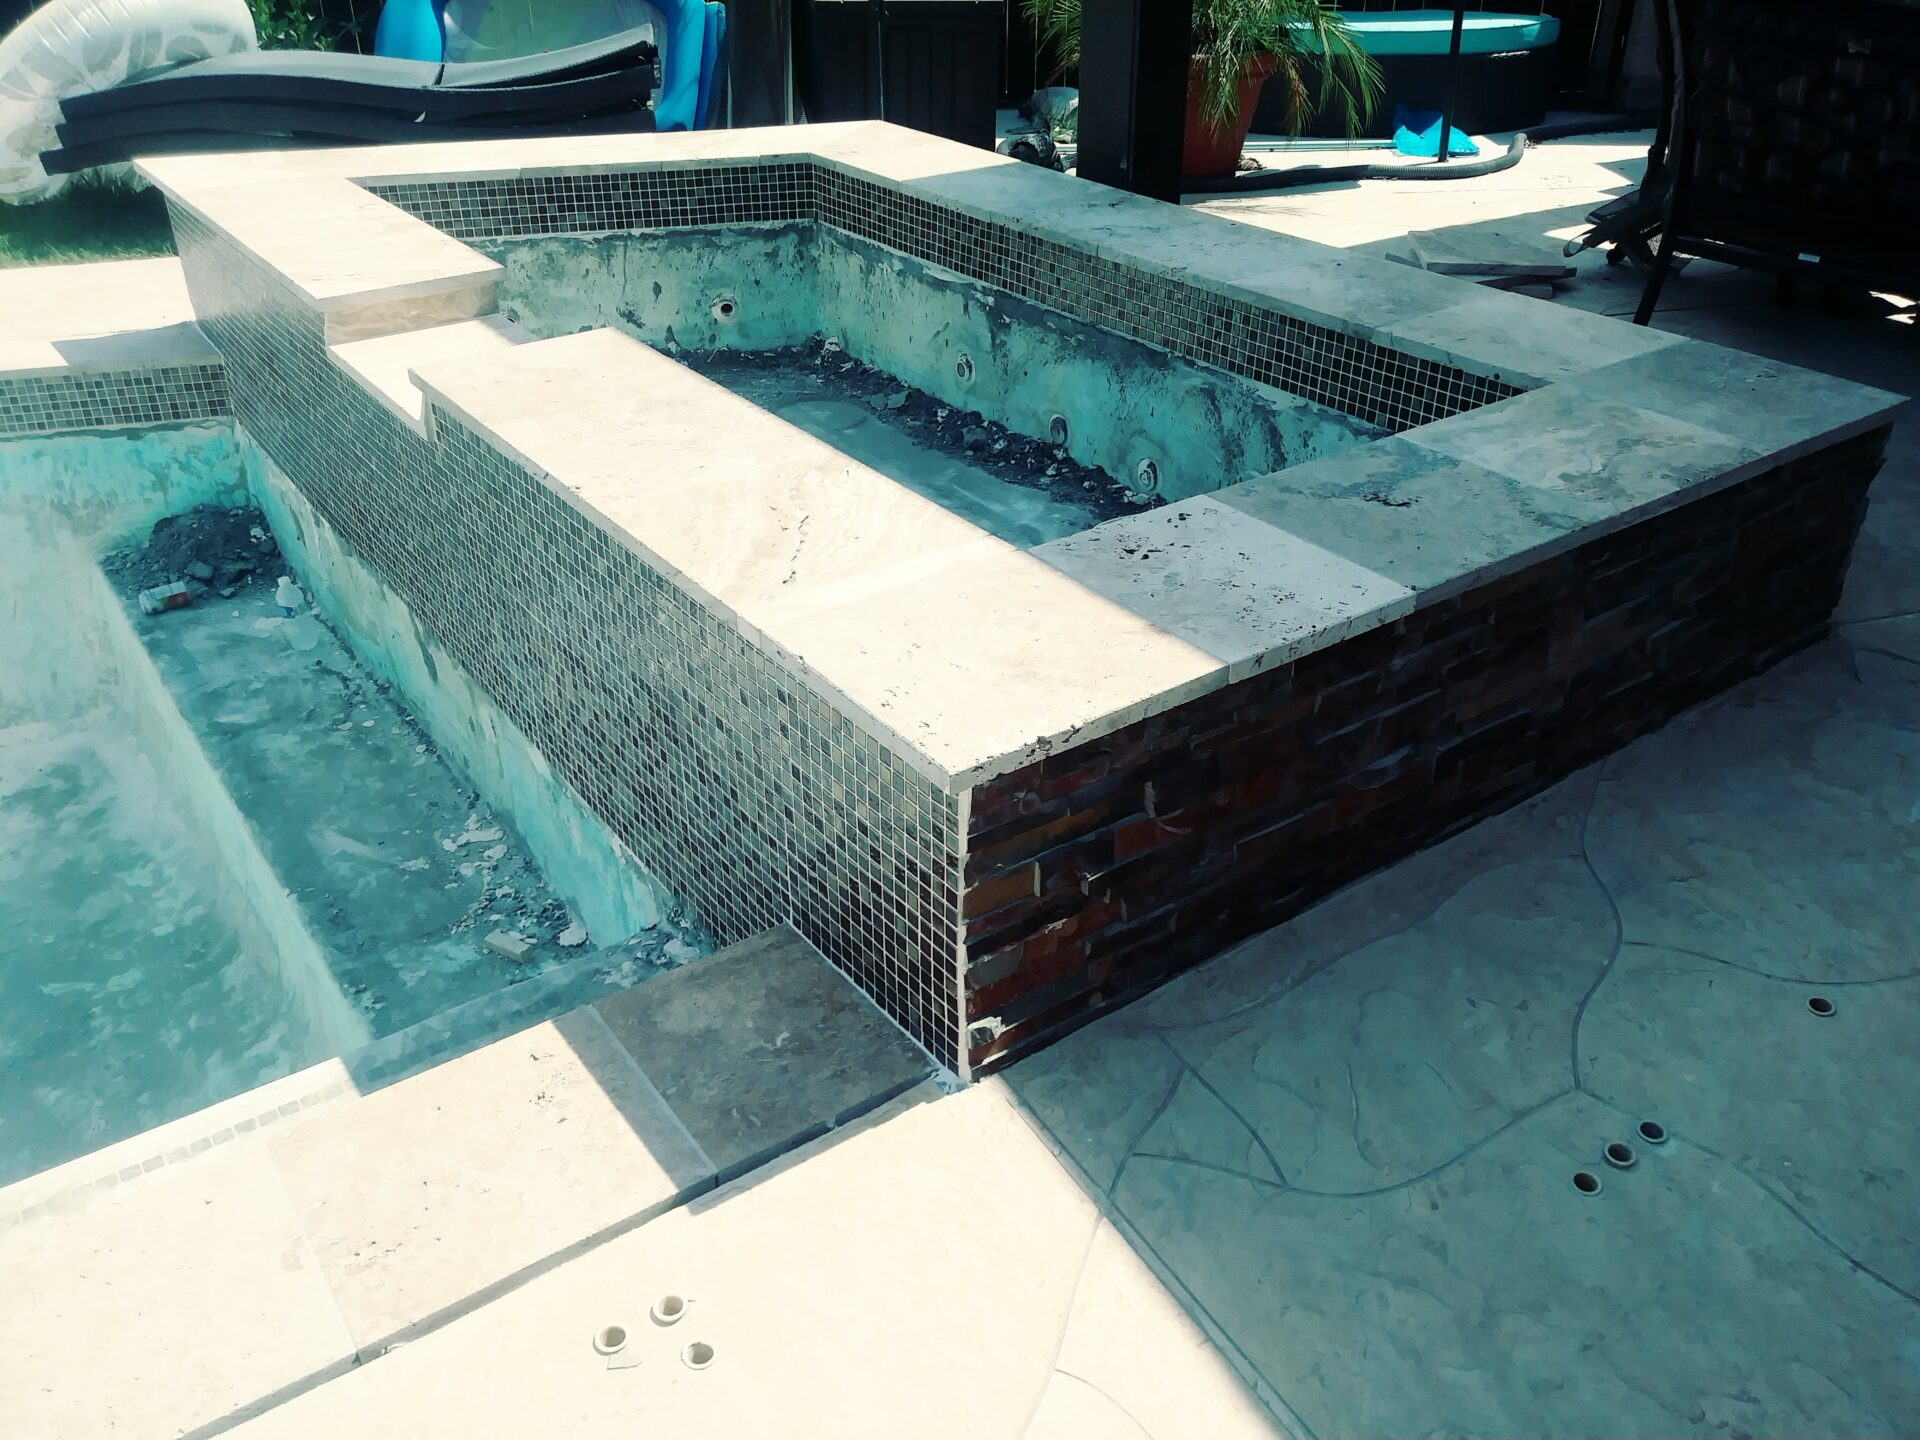 Pool Remodel - Katy - After Image006